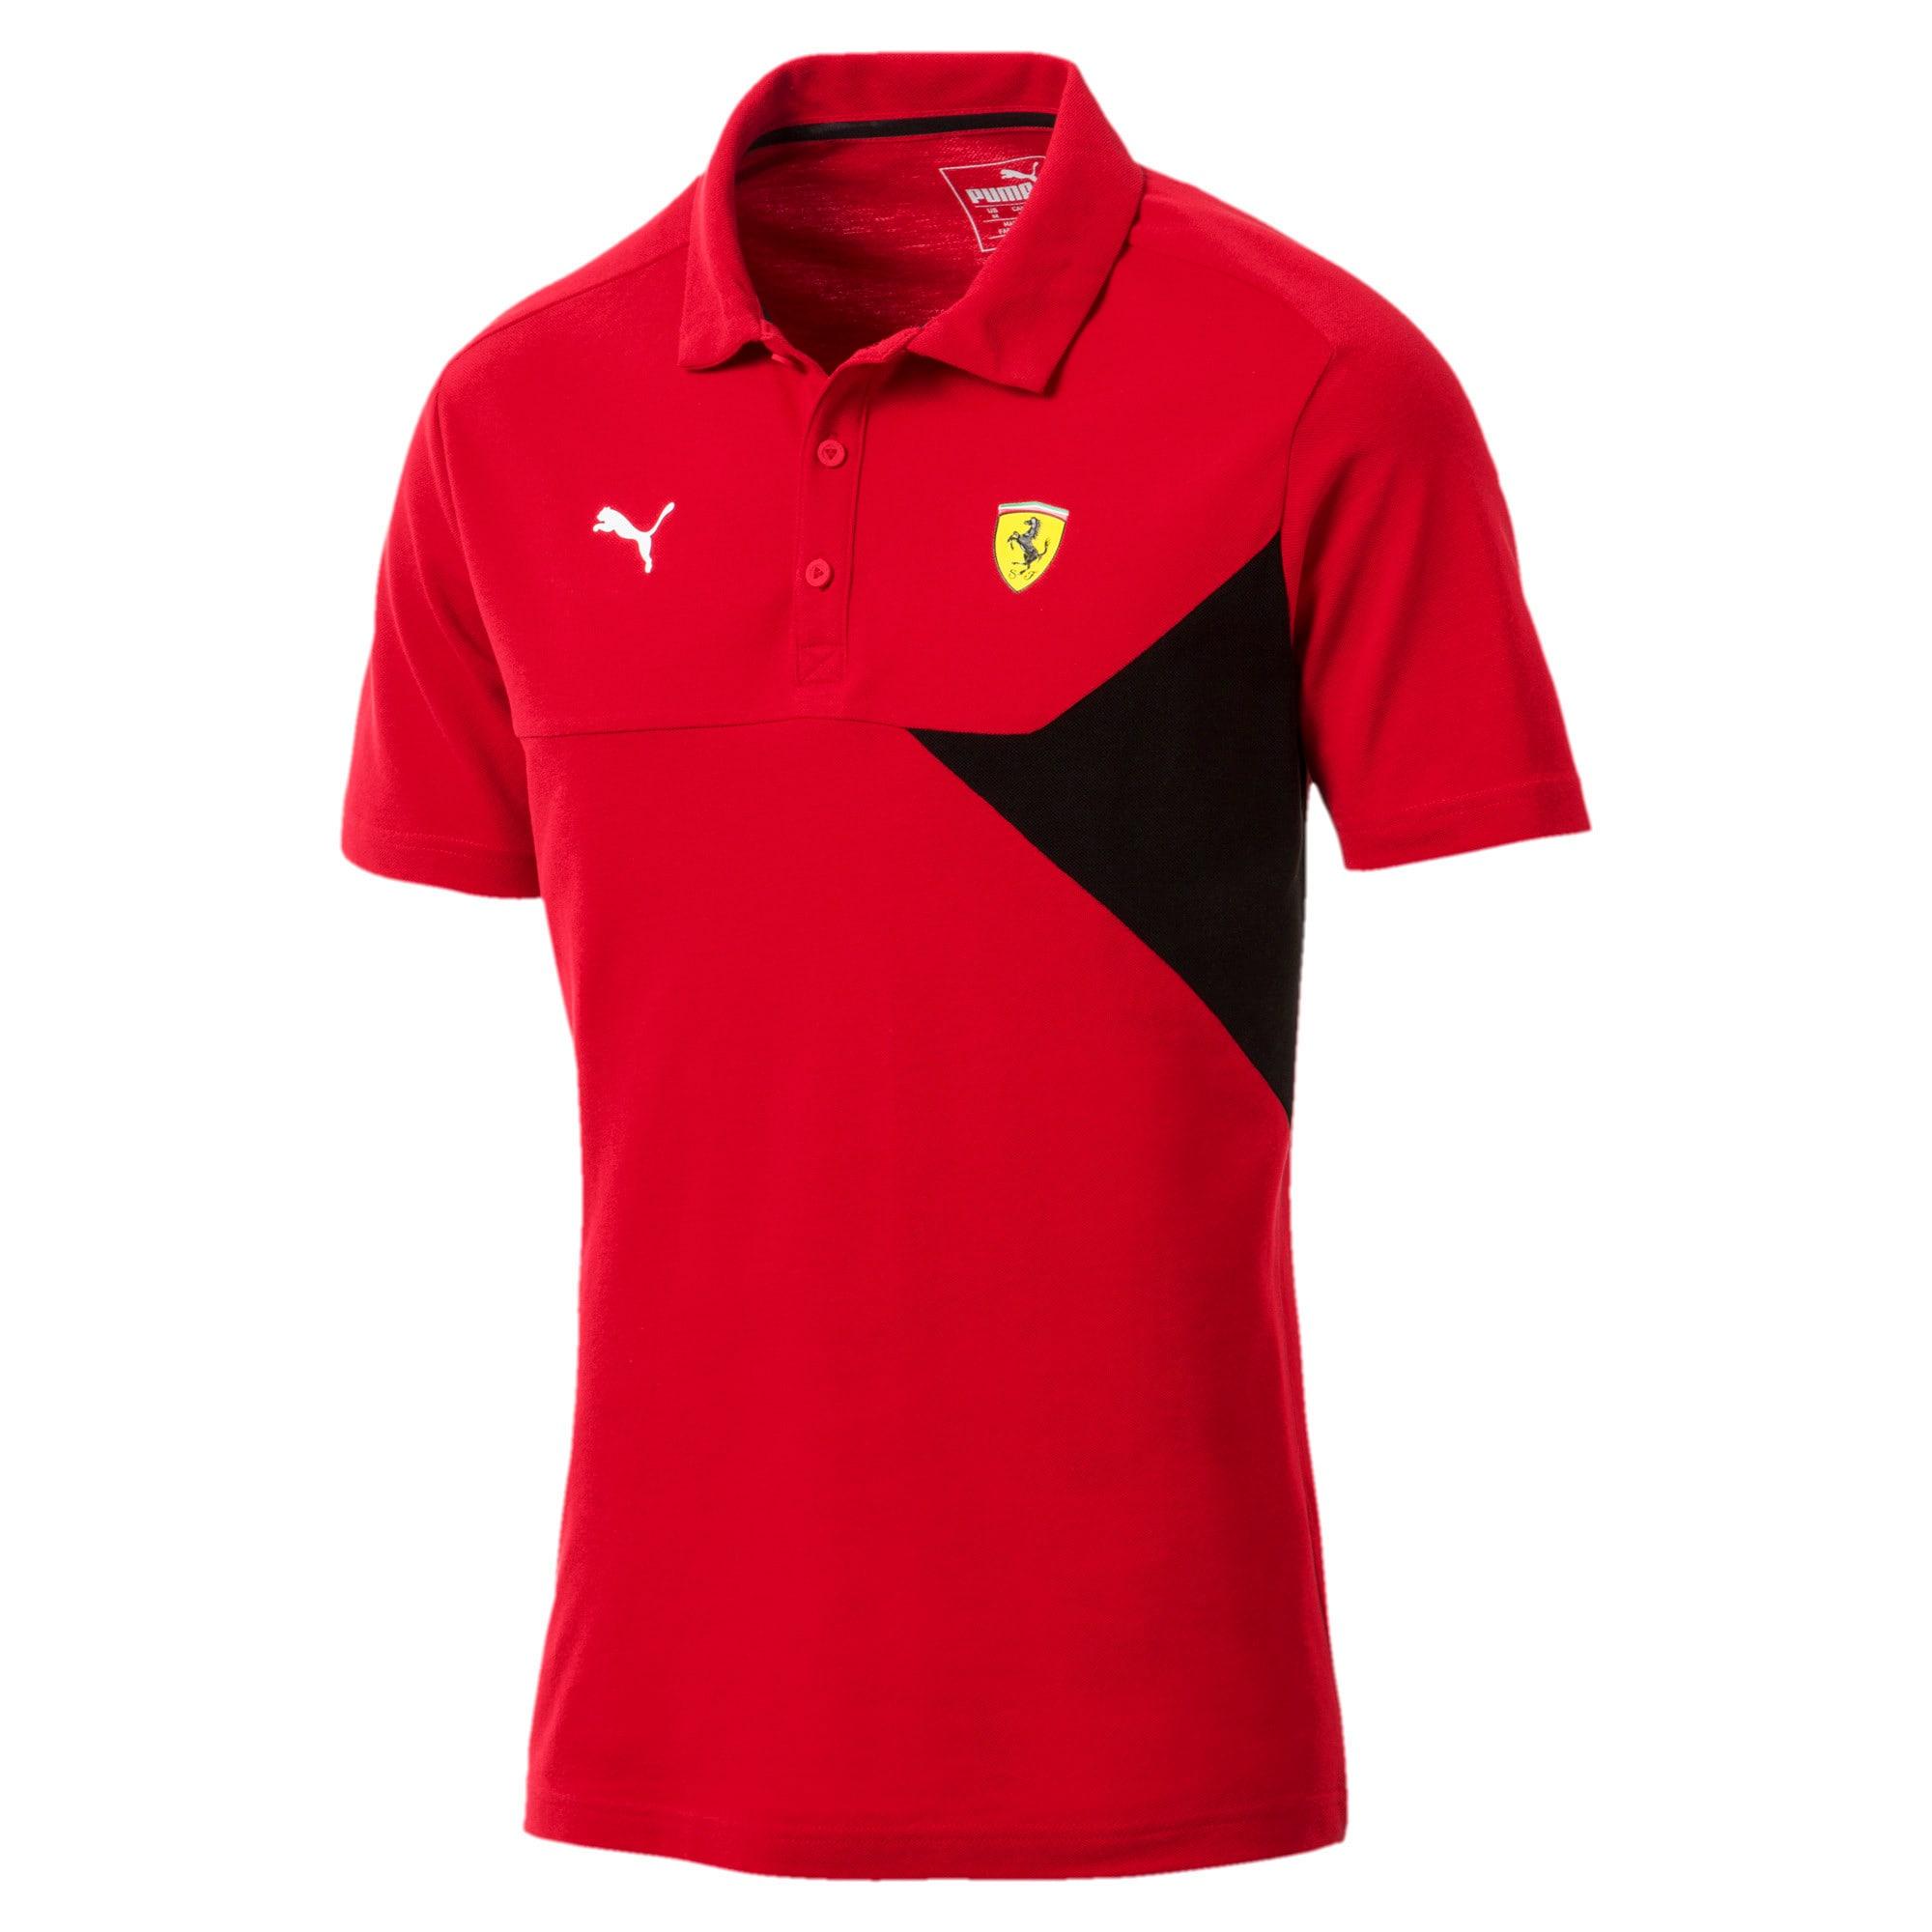 Thumbnail 4 of Ferrari Men's Polo, Rosso Corsa, medium-IND